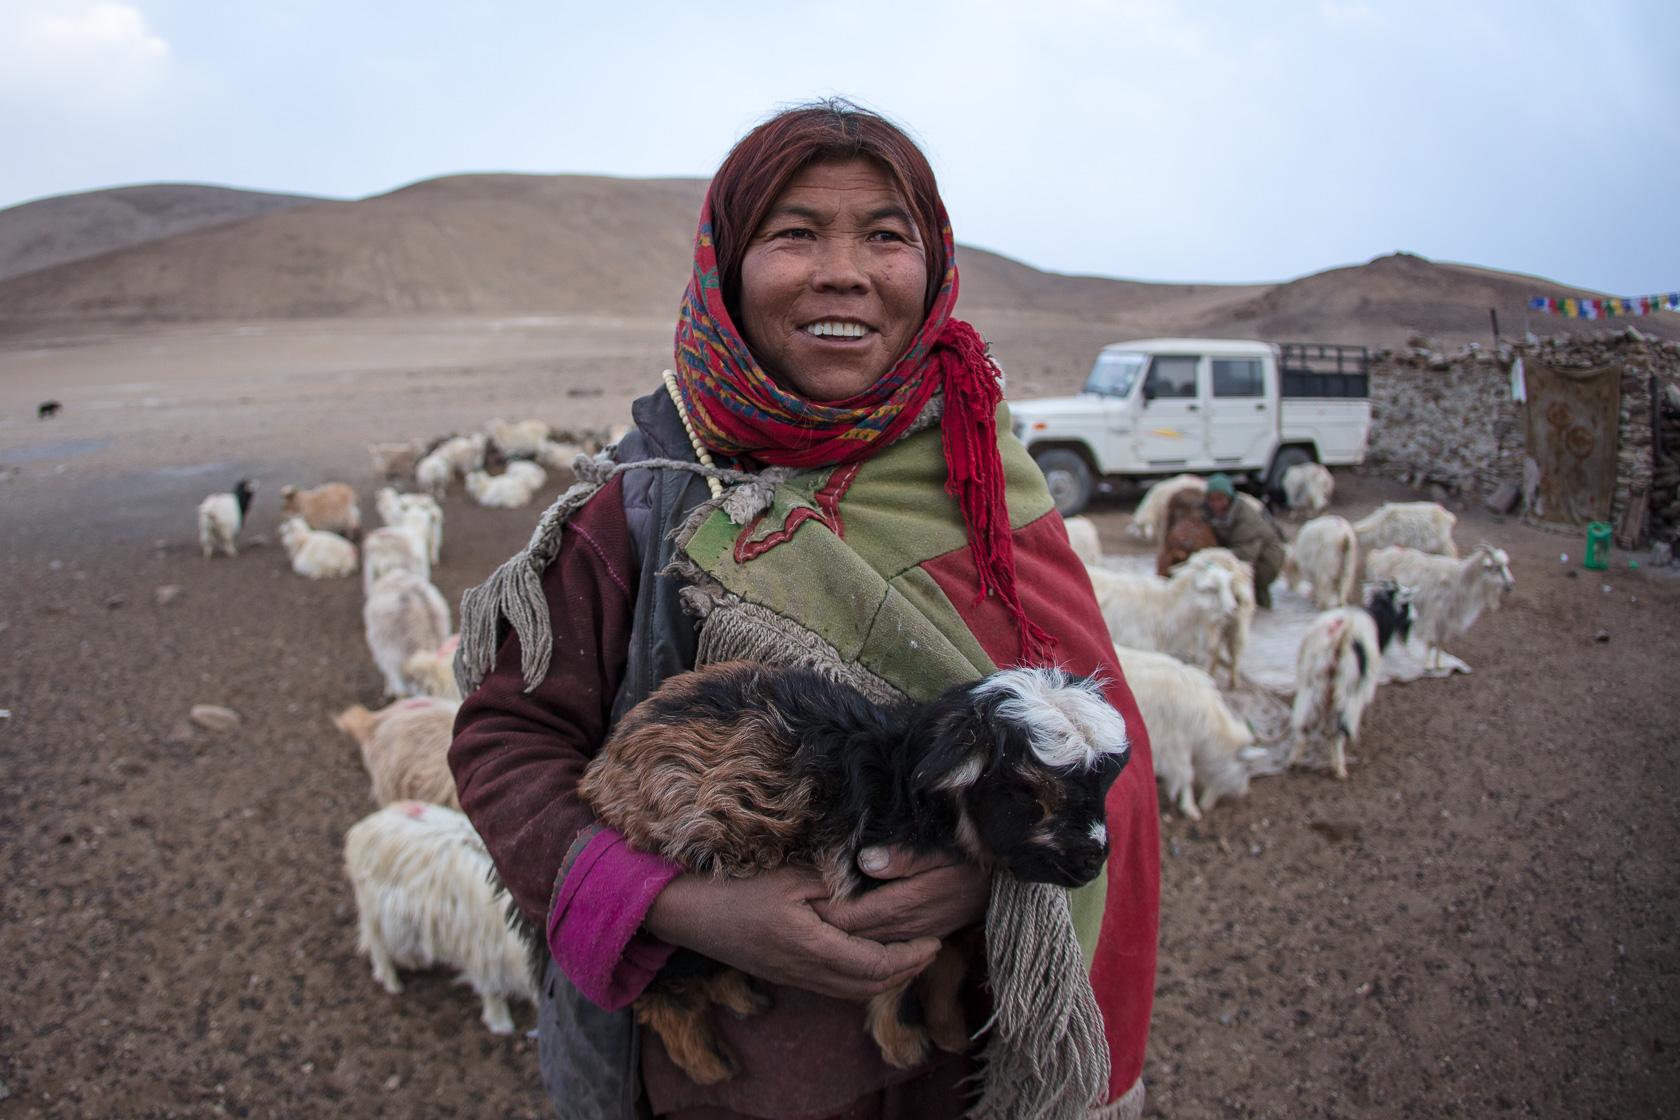 femme bergère changpa, près du Tso Kar, au ladakh en Inde